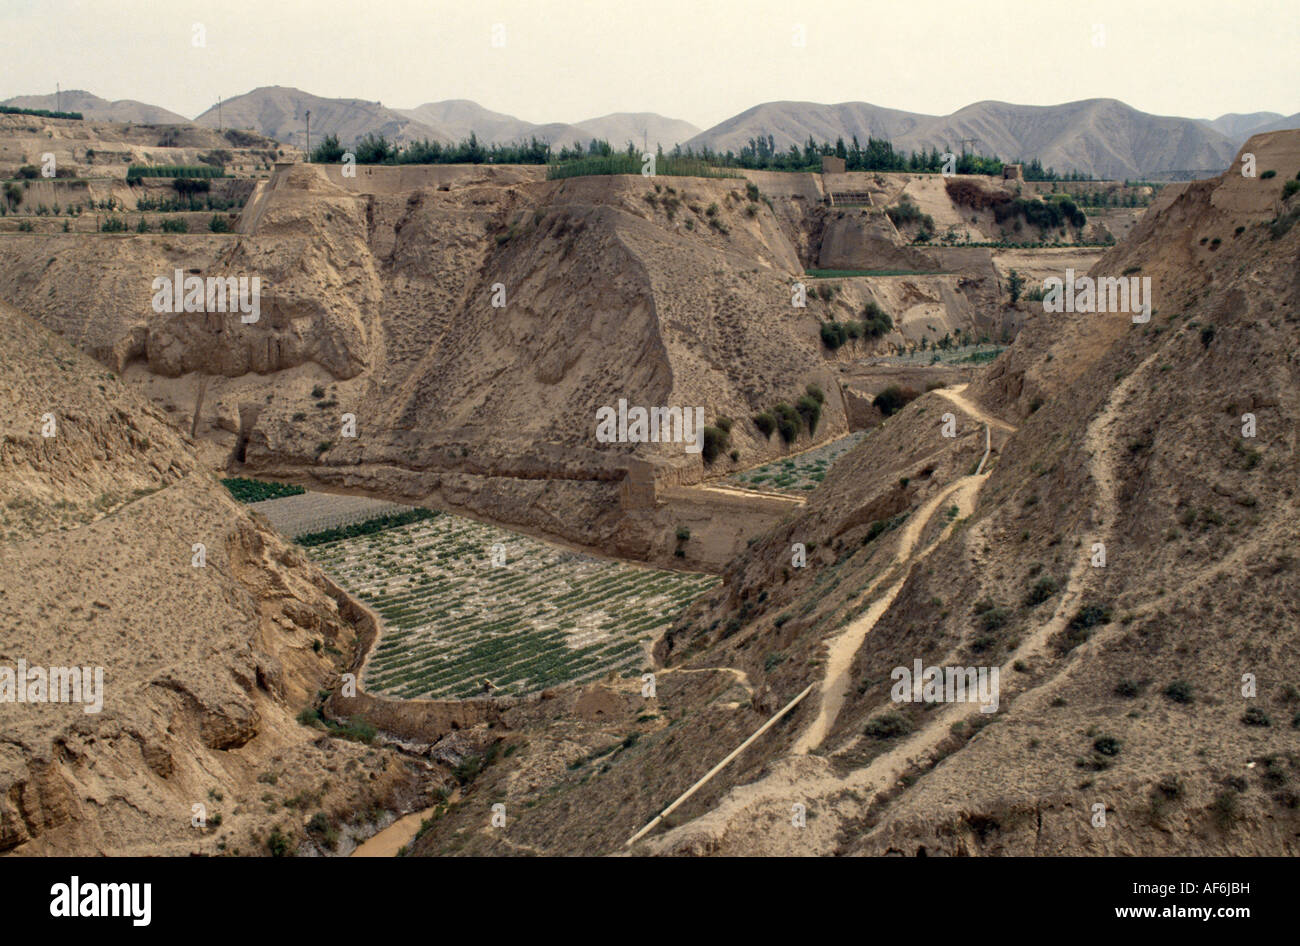 China Gansu Lanzhou Agricultura De Loess Valles Erosionados